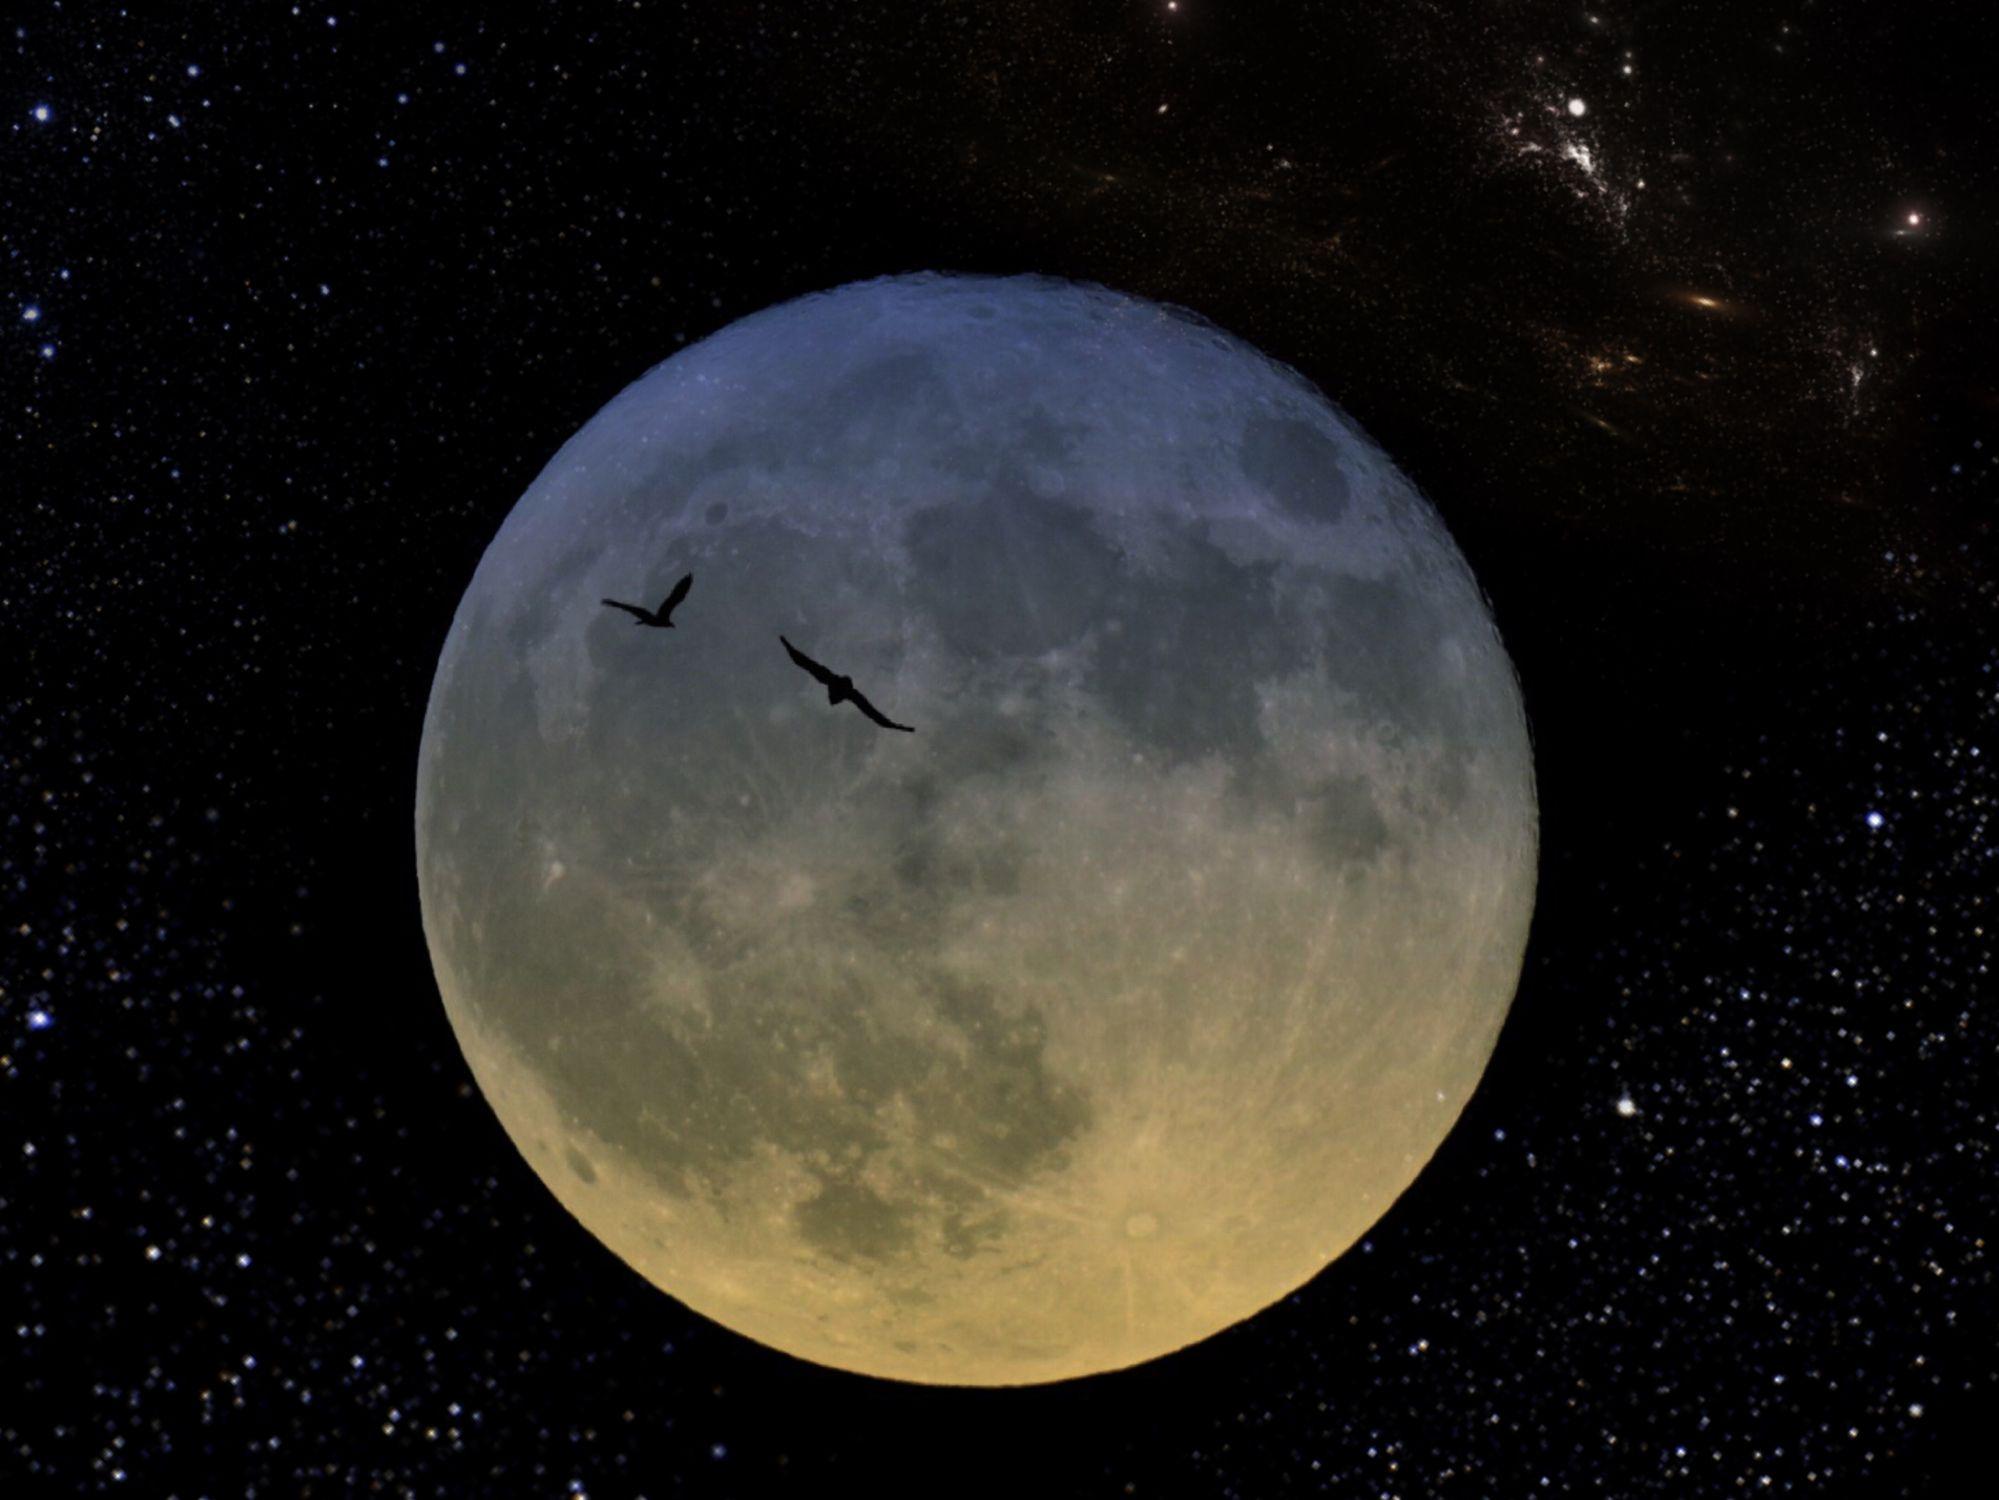 Harvest Moon 2018: Where Do Full Moons Get Their Names?